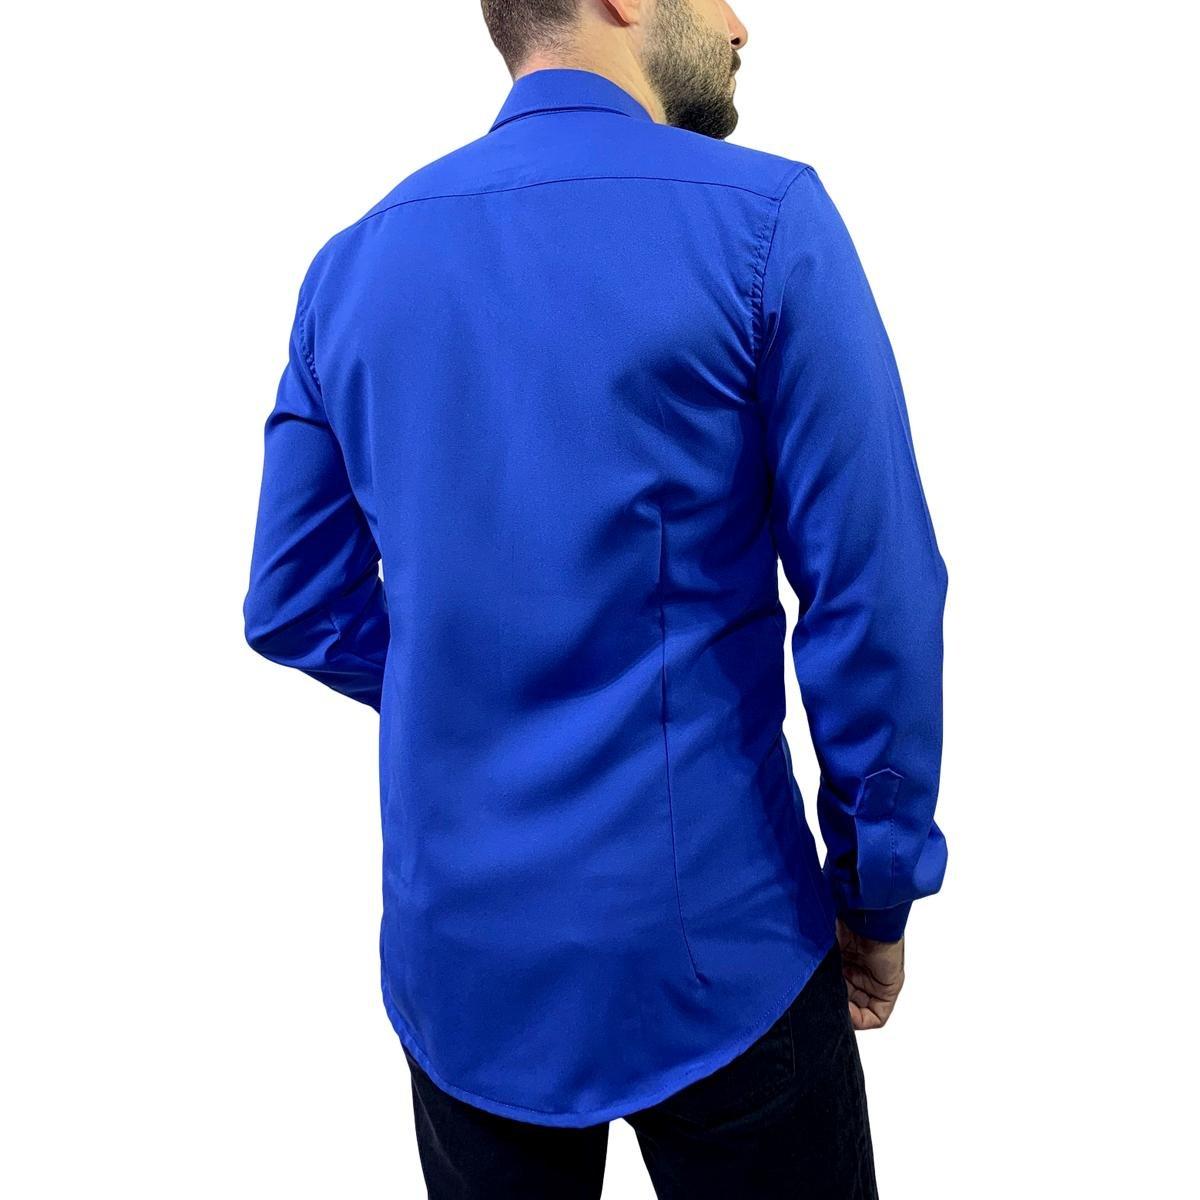 Camisa Social Manga Longa Slim Microfibra Vuzillo Masculina - Azul Royal